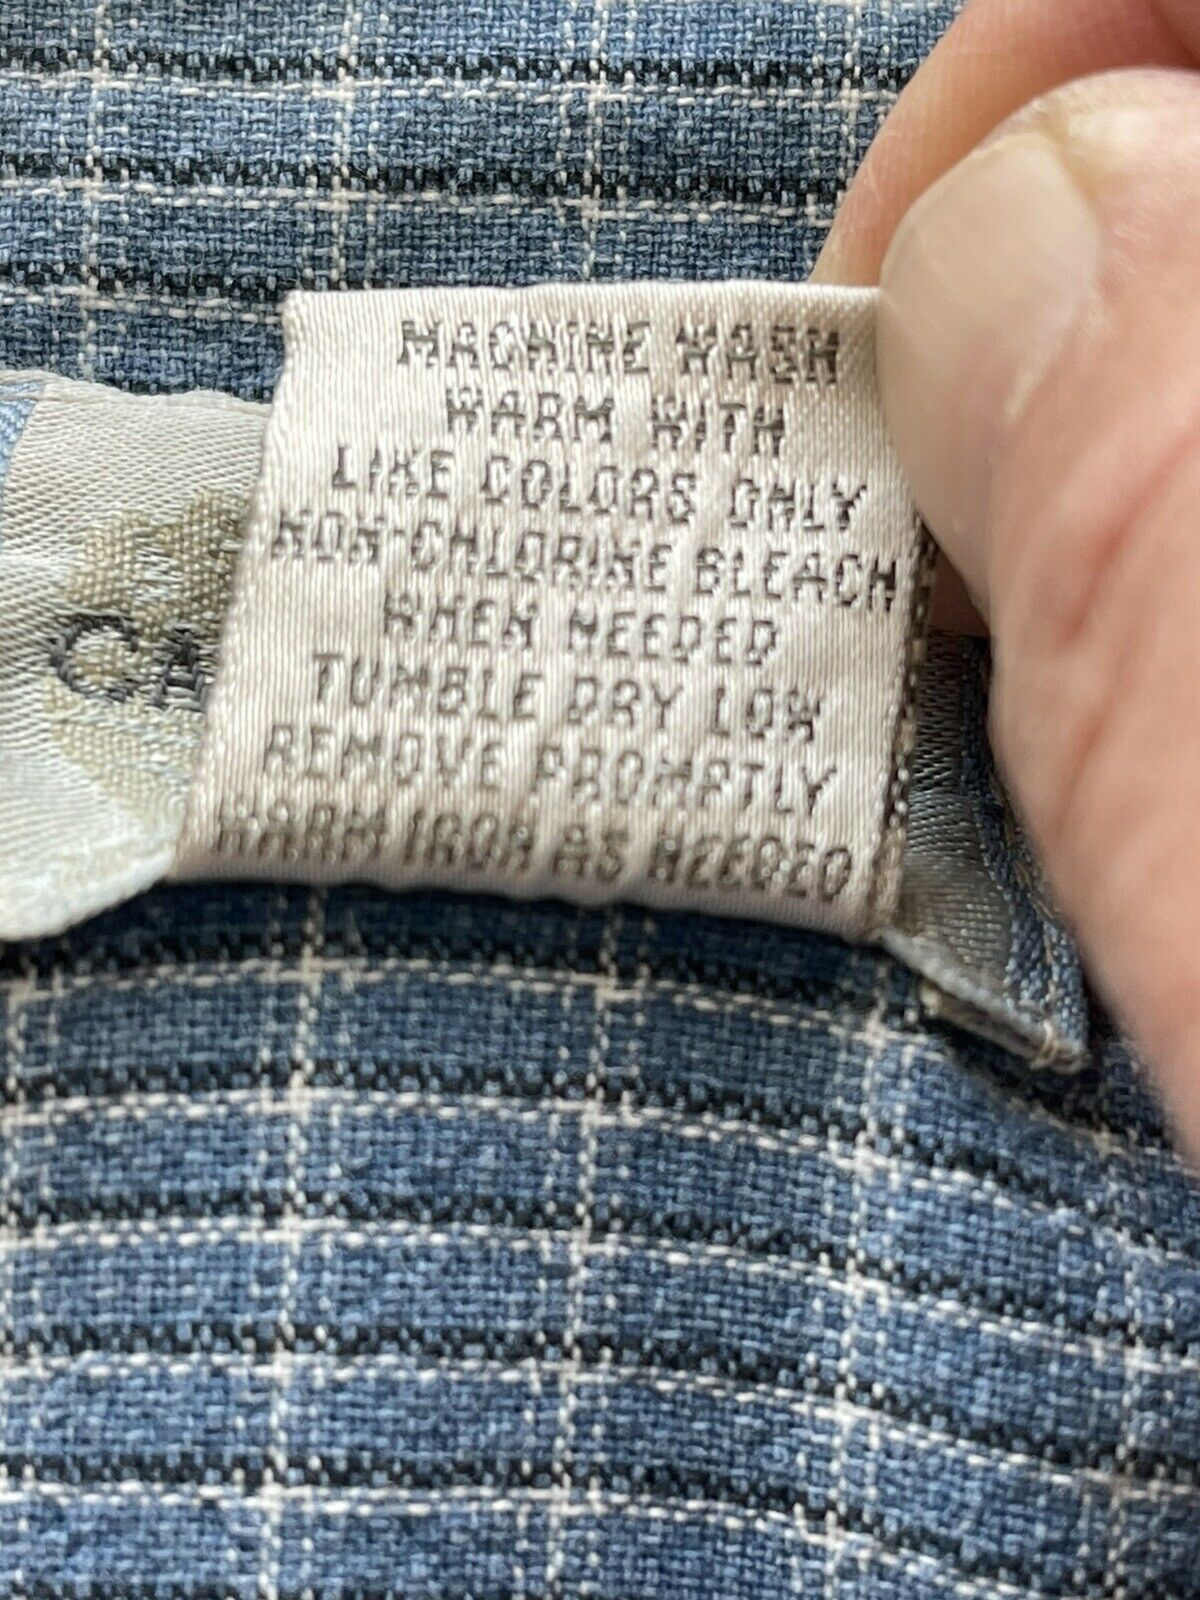 capristrano jeans jacket shirt - image 5